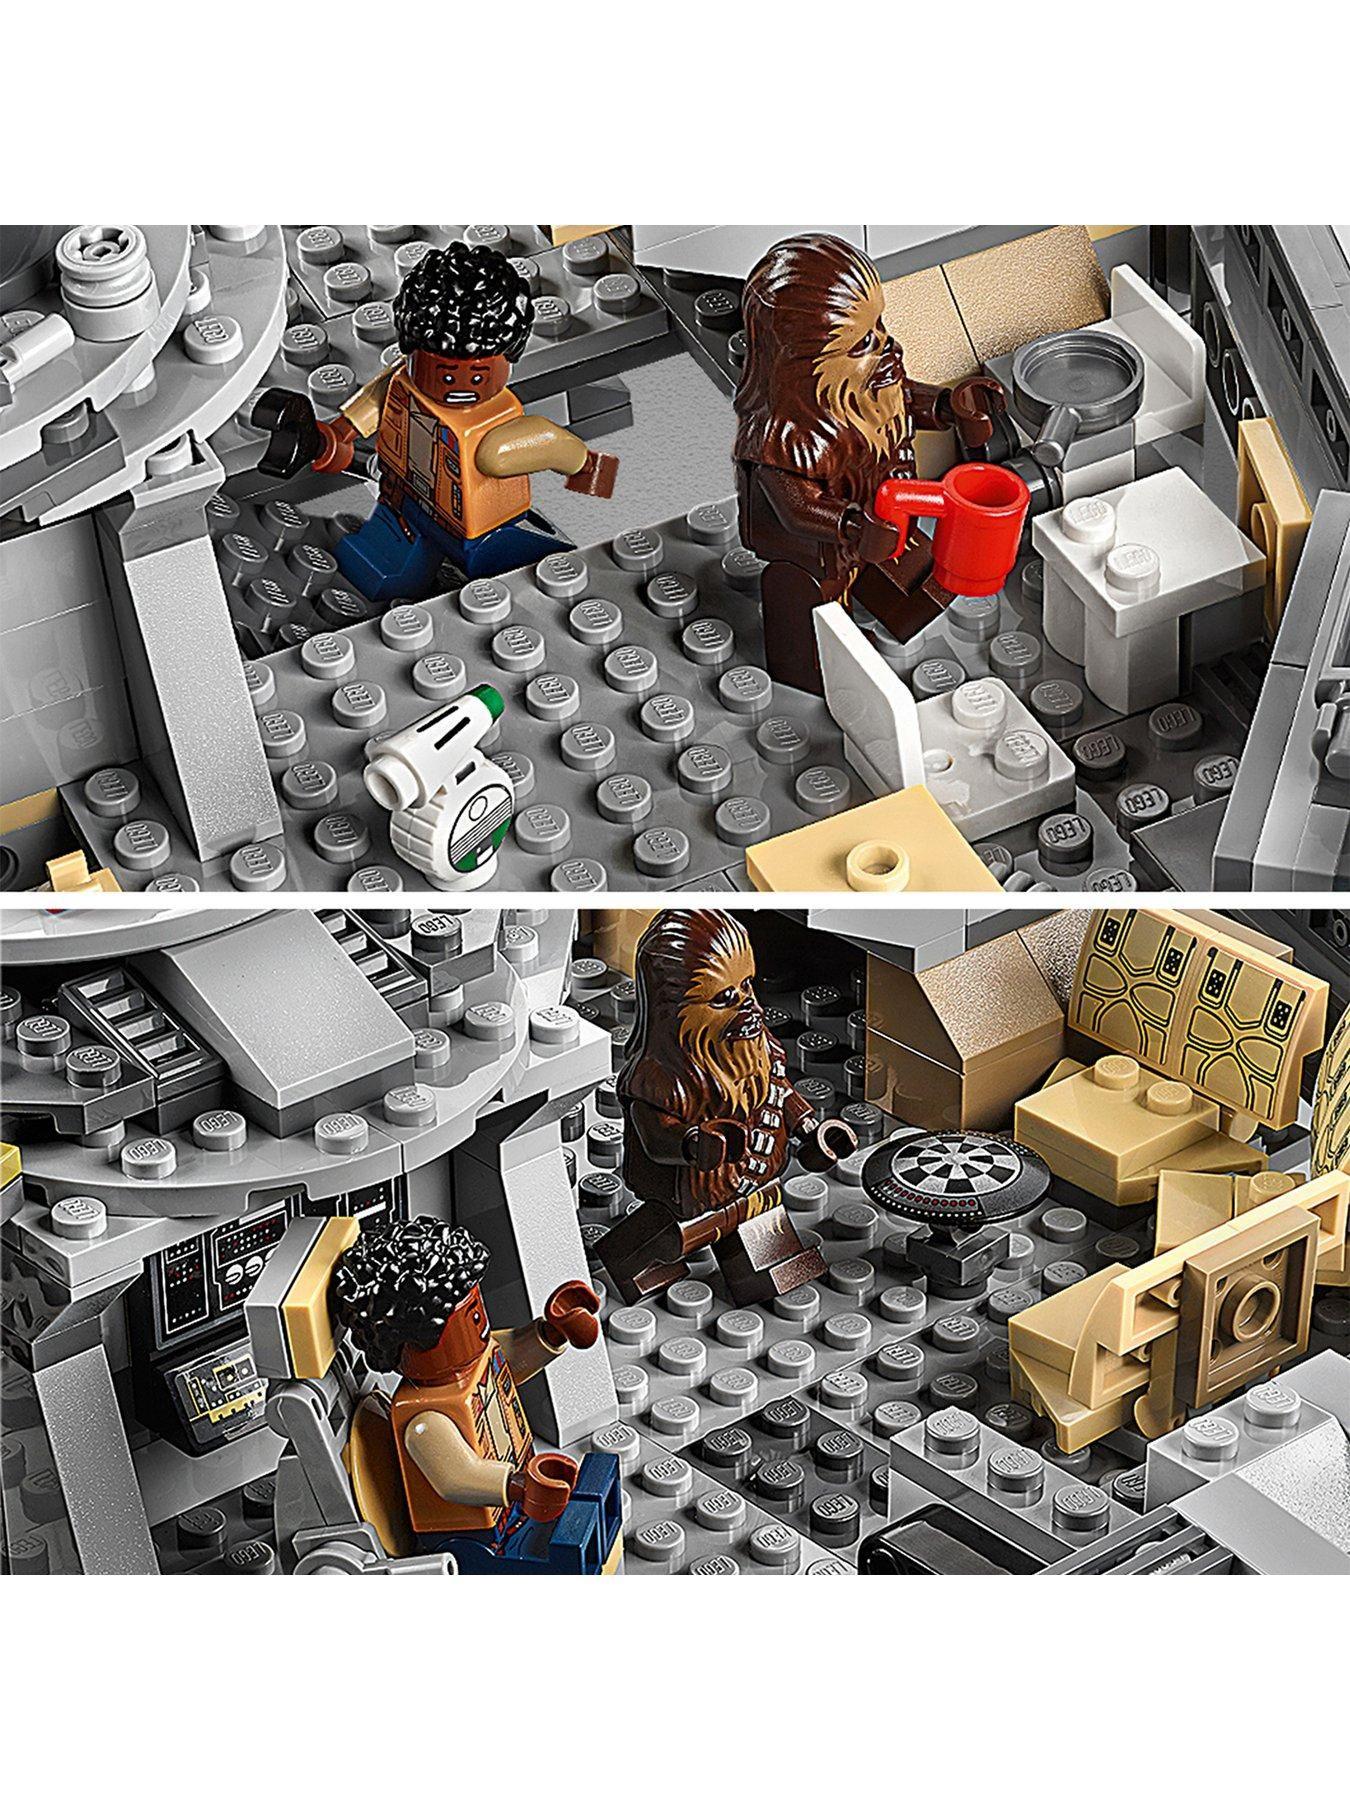 Lego Star Wars 75257 Millennium Falcon Starship With 7 Characters One Colour Lego Star Wars Lego Star Millennium Falcon